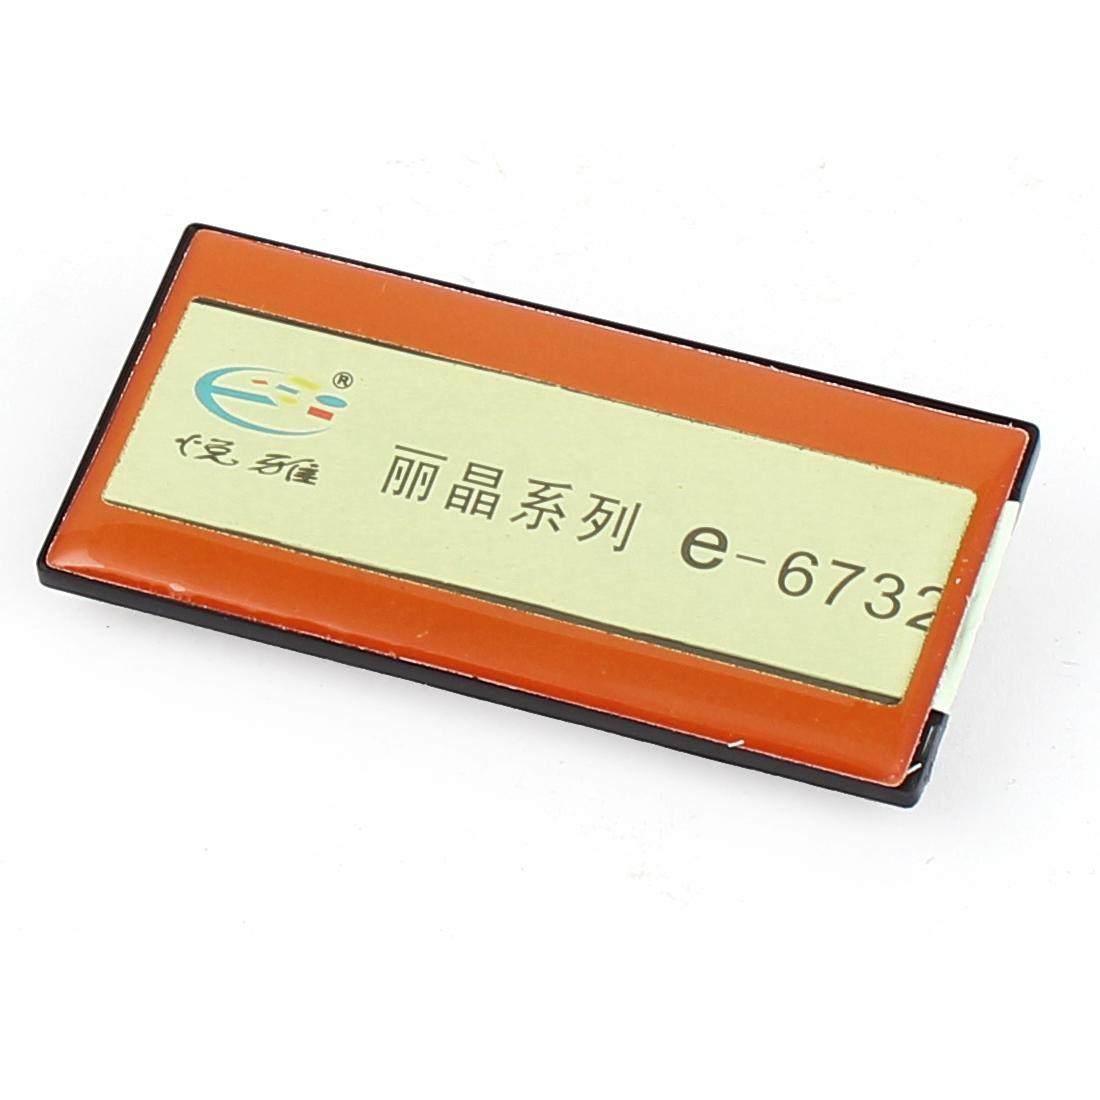 Orange Plastic Horizontal Business Name Tag Clip Safetypin Holder